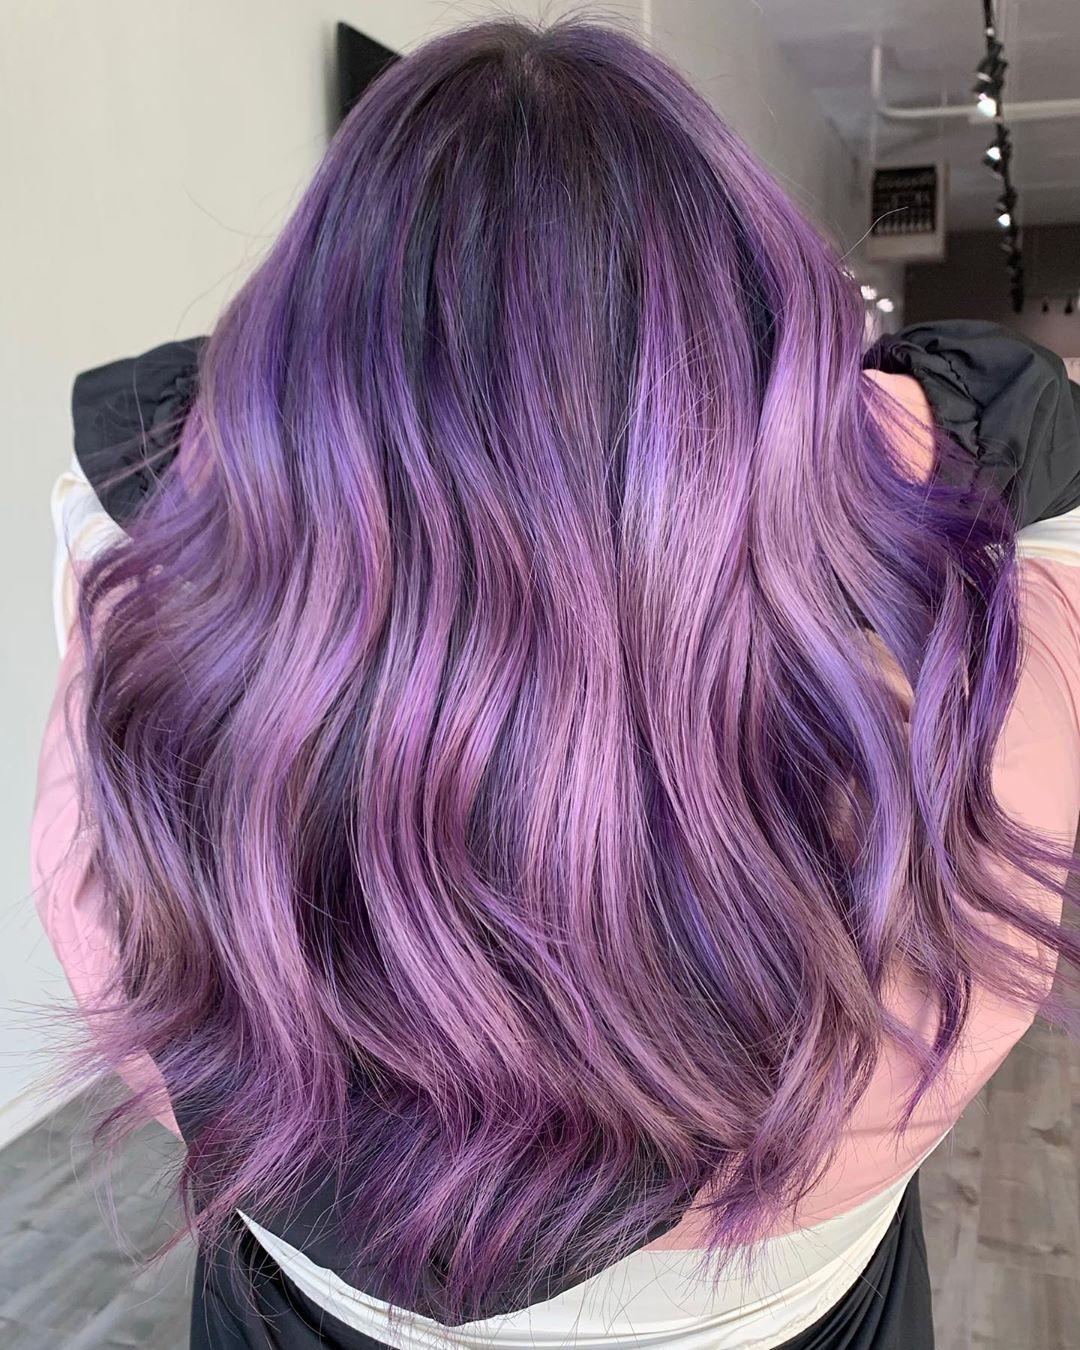 Capelli lunghi mossi con balayage viola melanzana